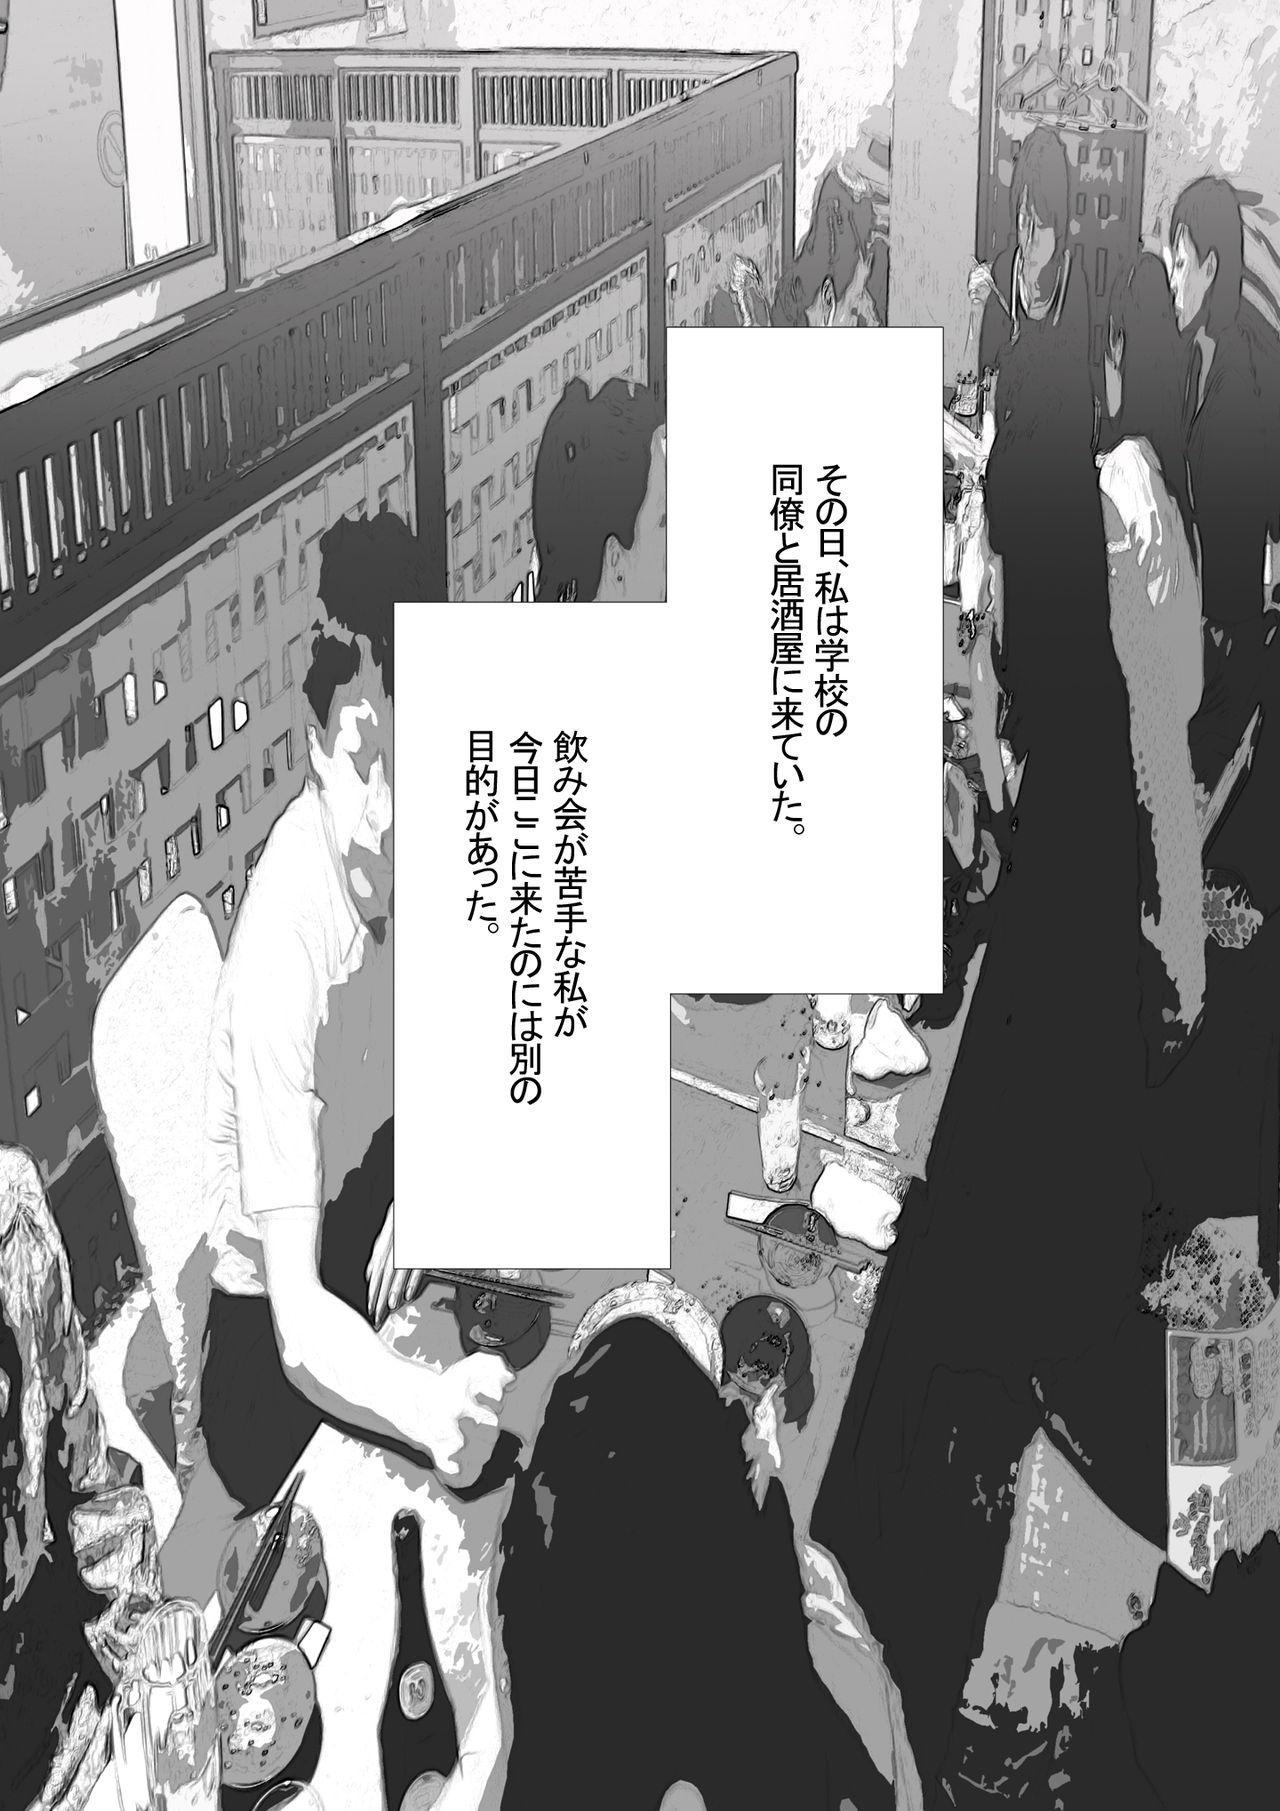 市ノ瀬美加子の場合 1